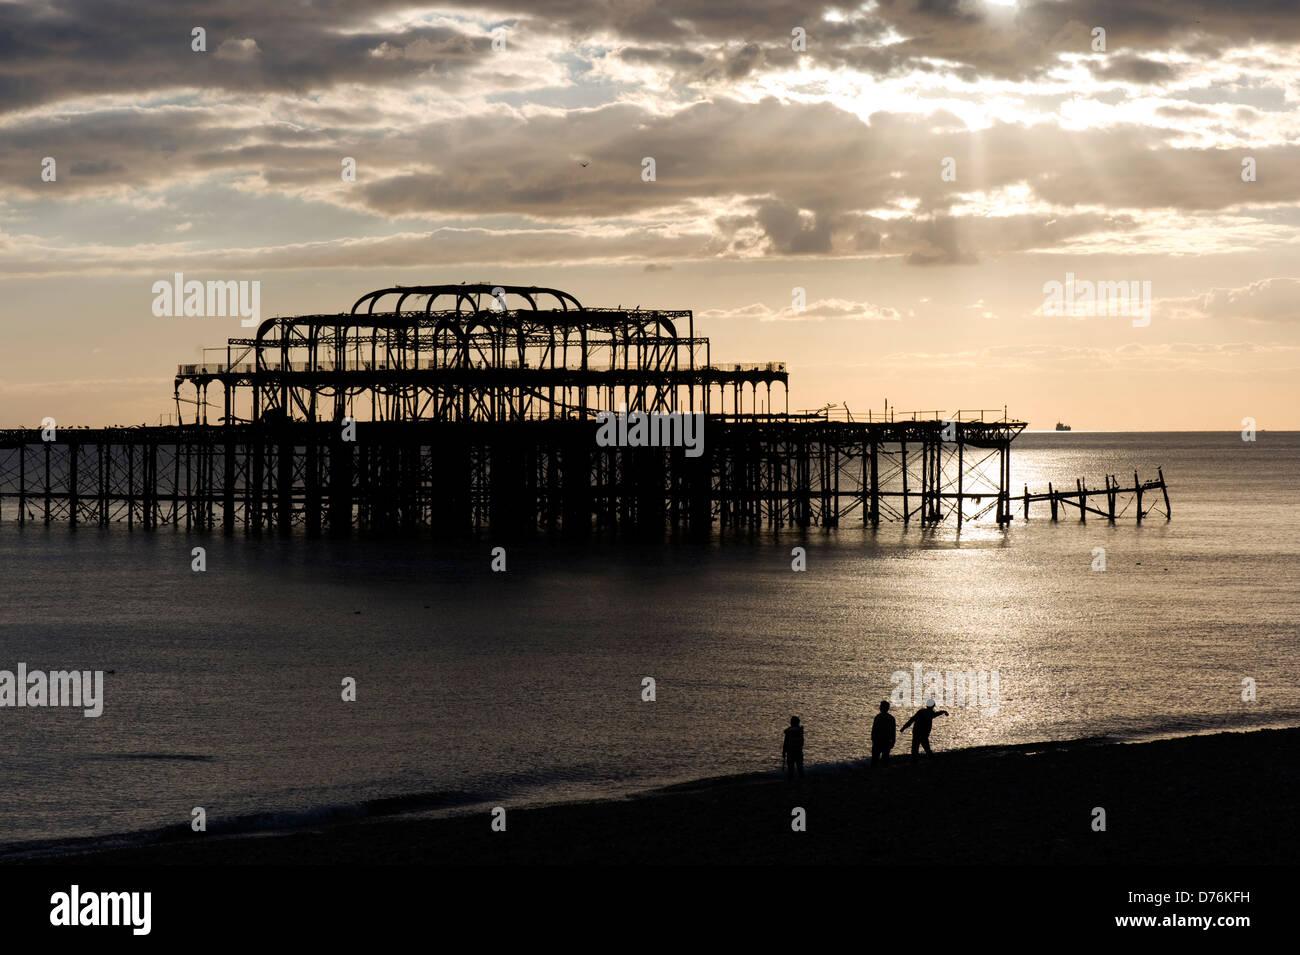 West Pier, Brighton beach, England Stock Photo